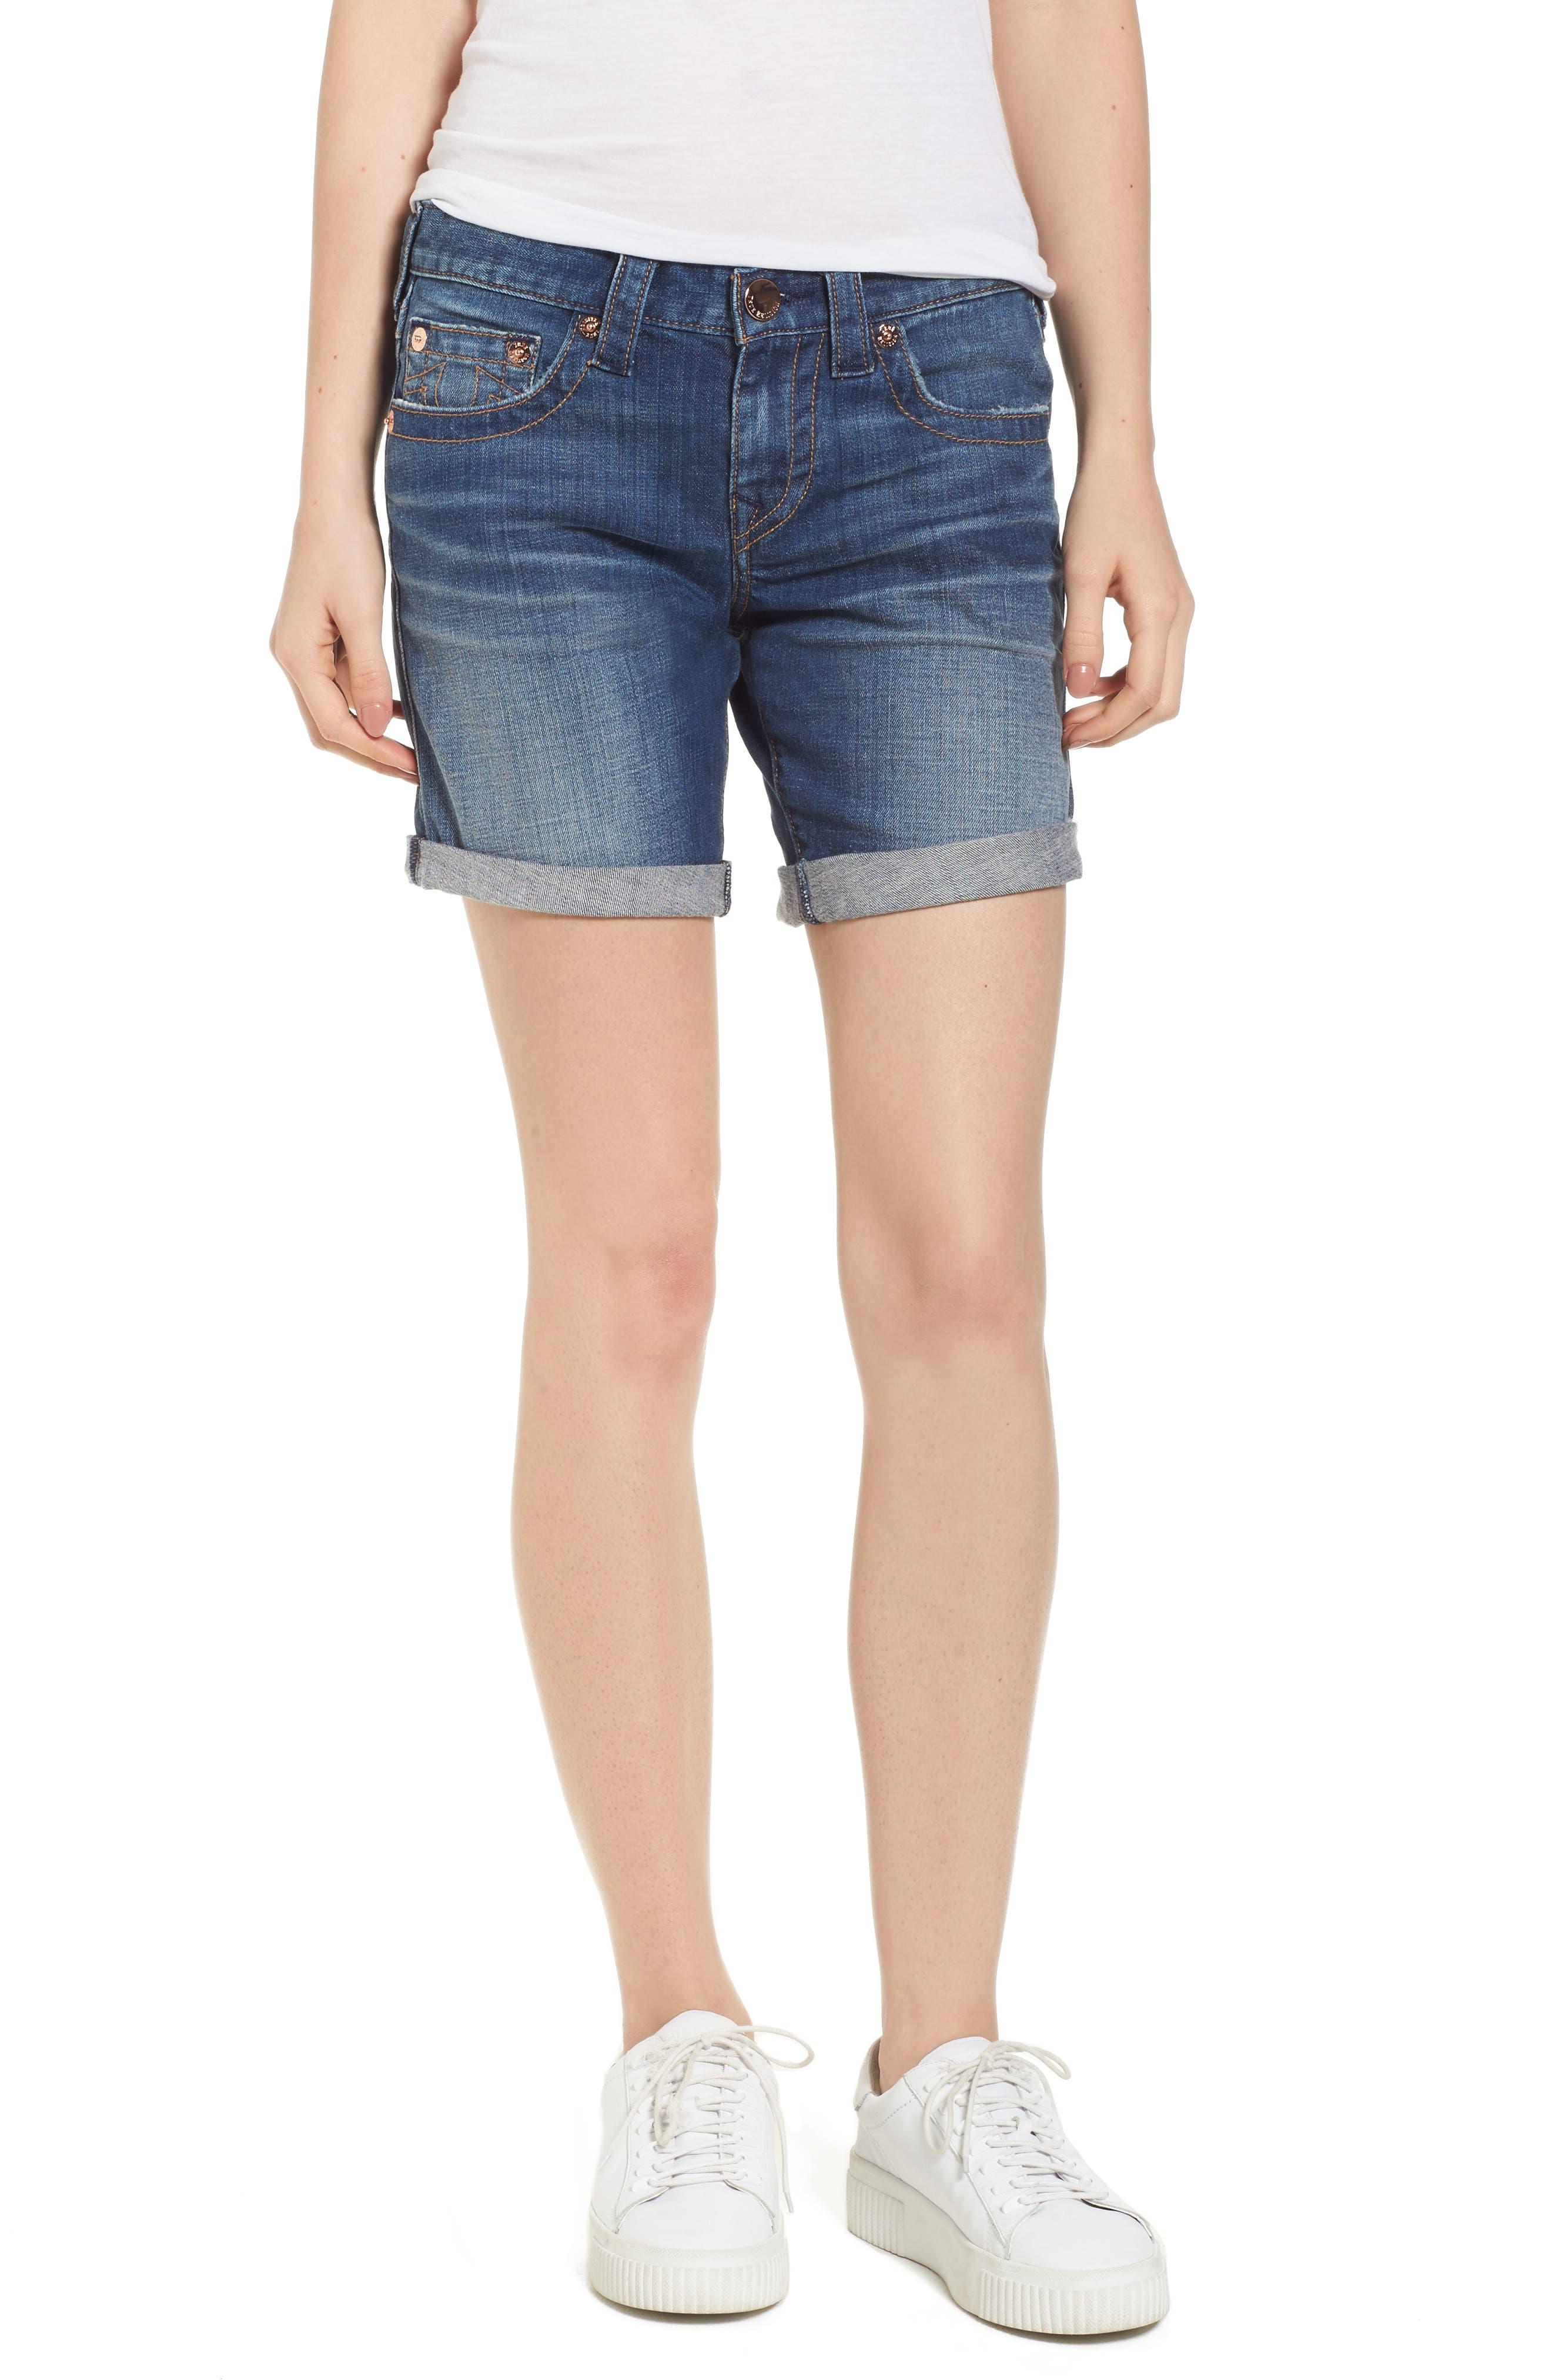 Jayde Shorts,                         Main,                         color, Hardware Blue